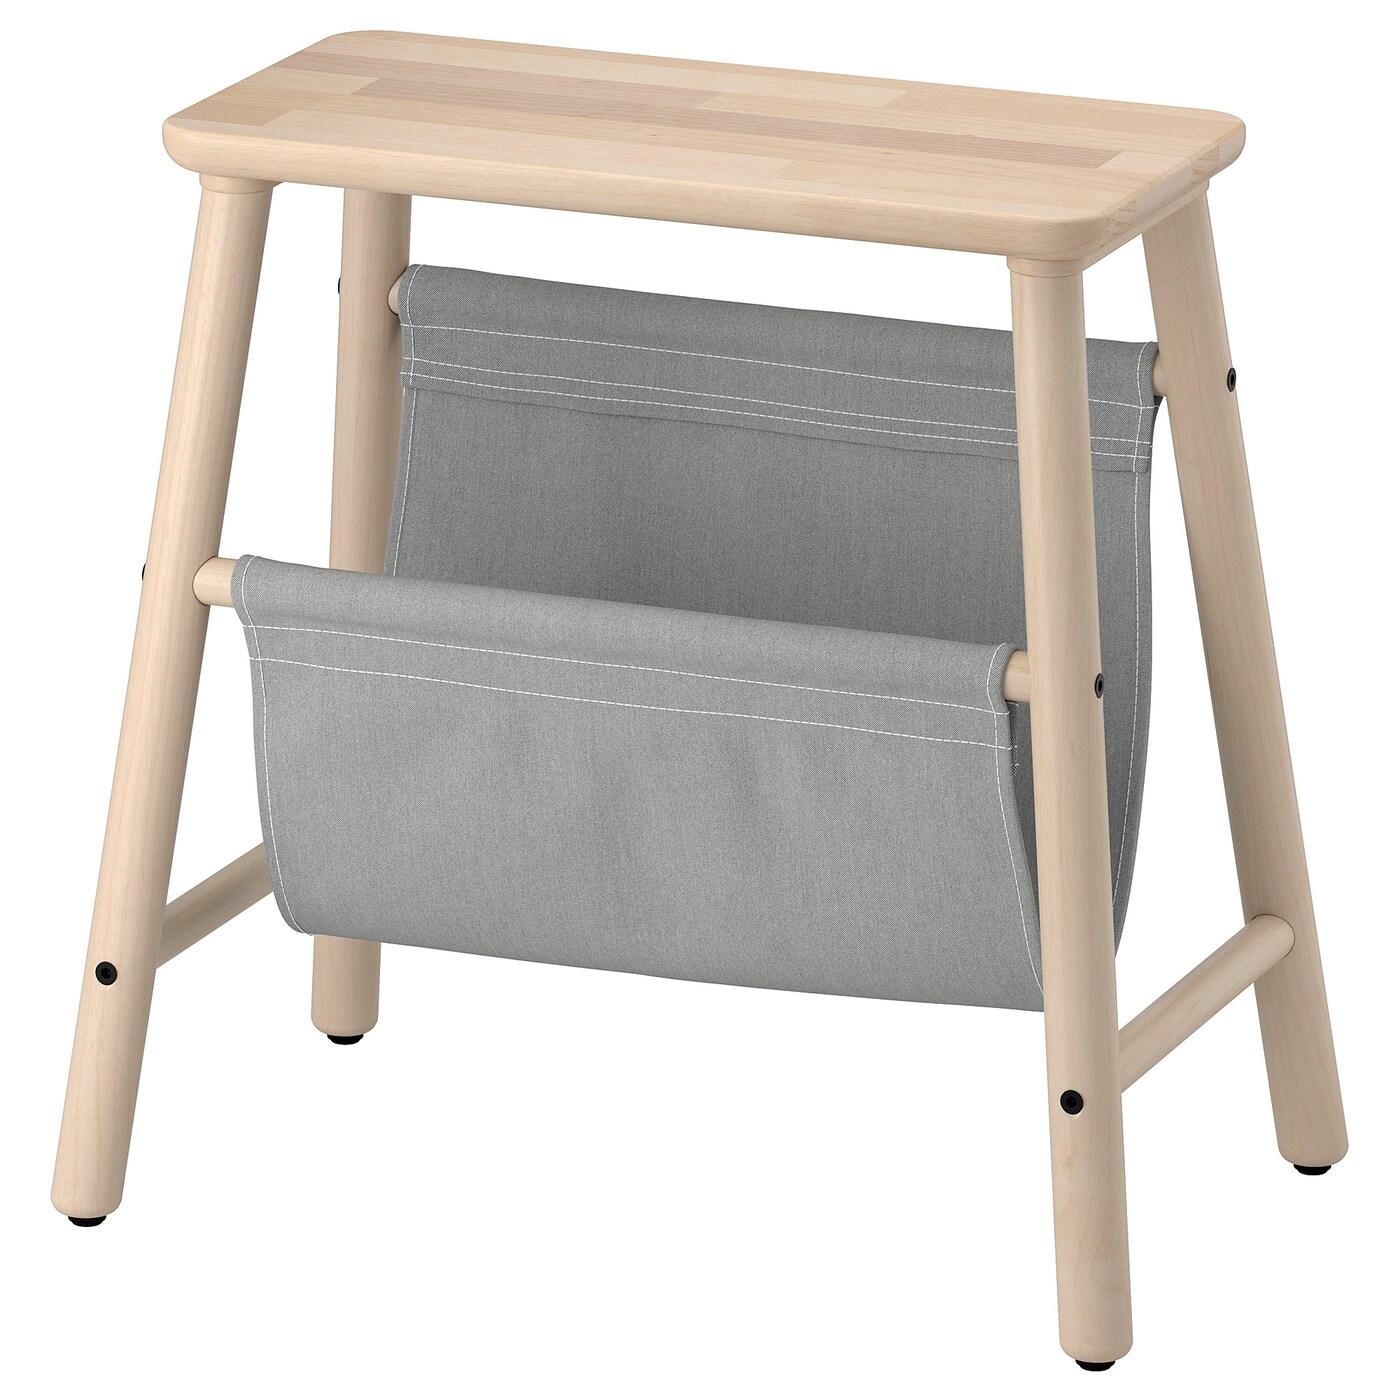 "VILTO Storage stool - birch 6 6/6 """